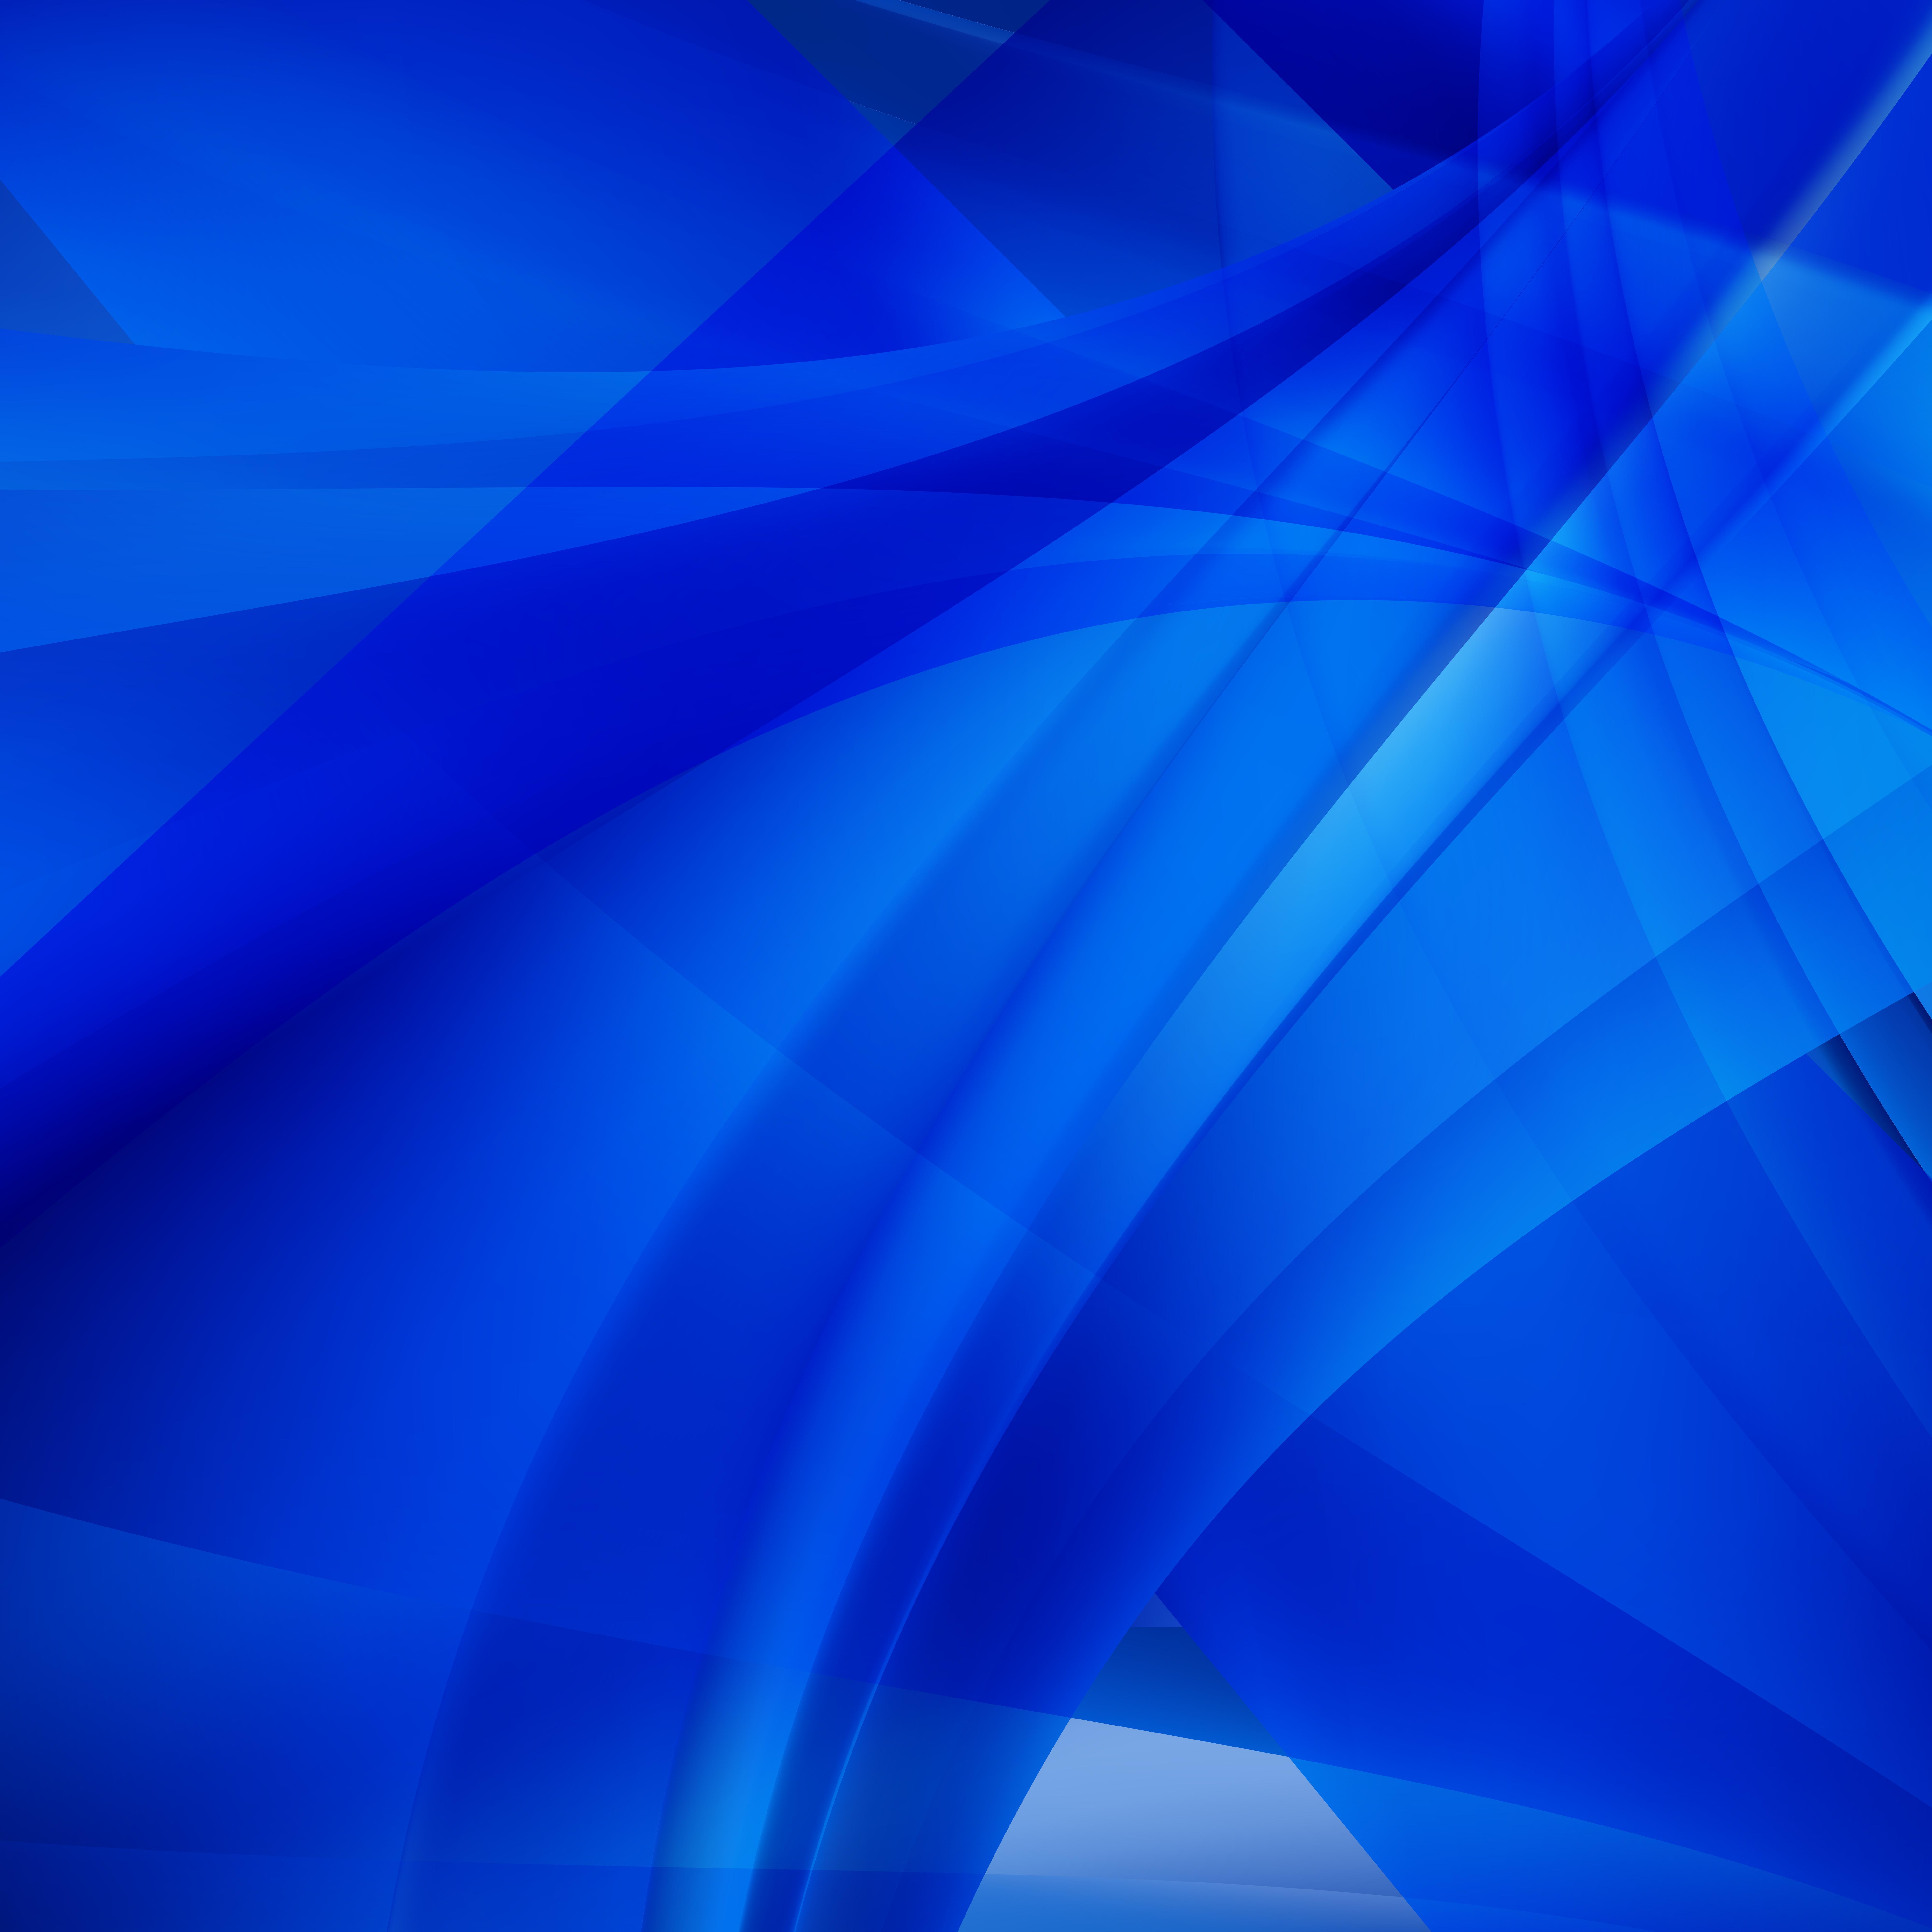 Free Royal Blue Background